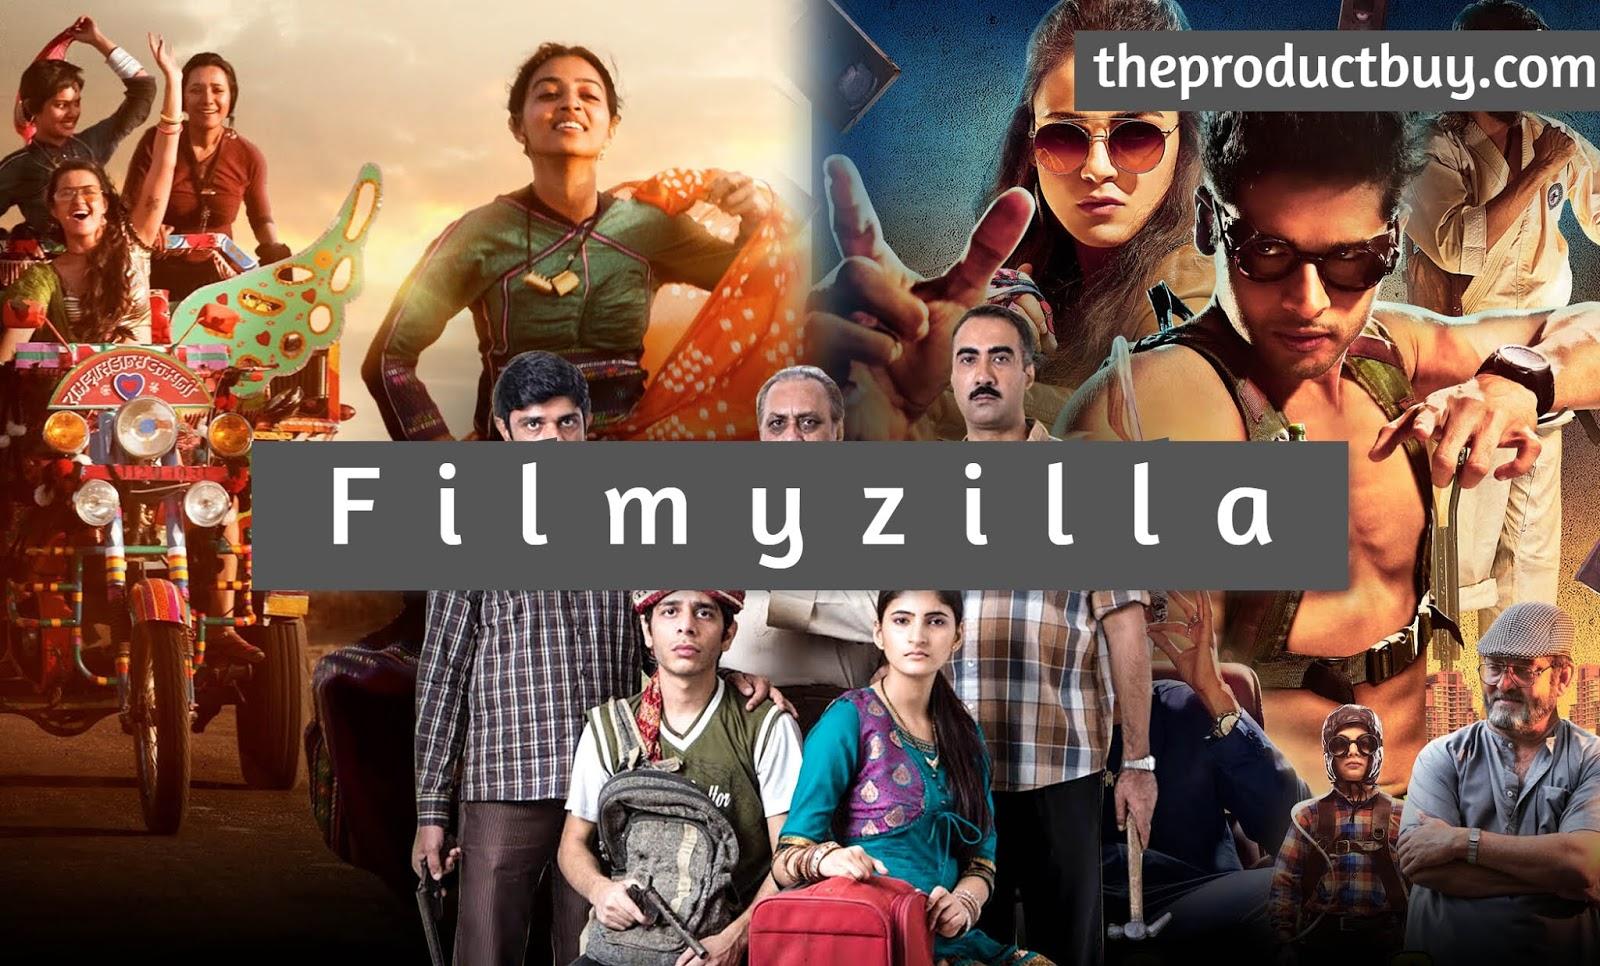 Filmyzilla 2020 : filmyzilla , filmyzilla 2018, filmyzilla hollywood movie , filmyzilla south , filmyzilla.com 2017 , filmyzilla.in 2020,filmyzilla punjabi,